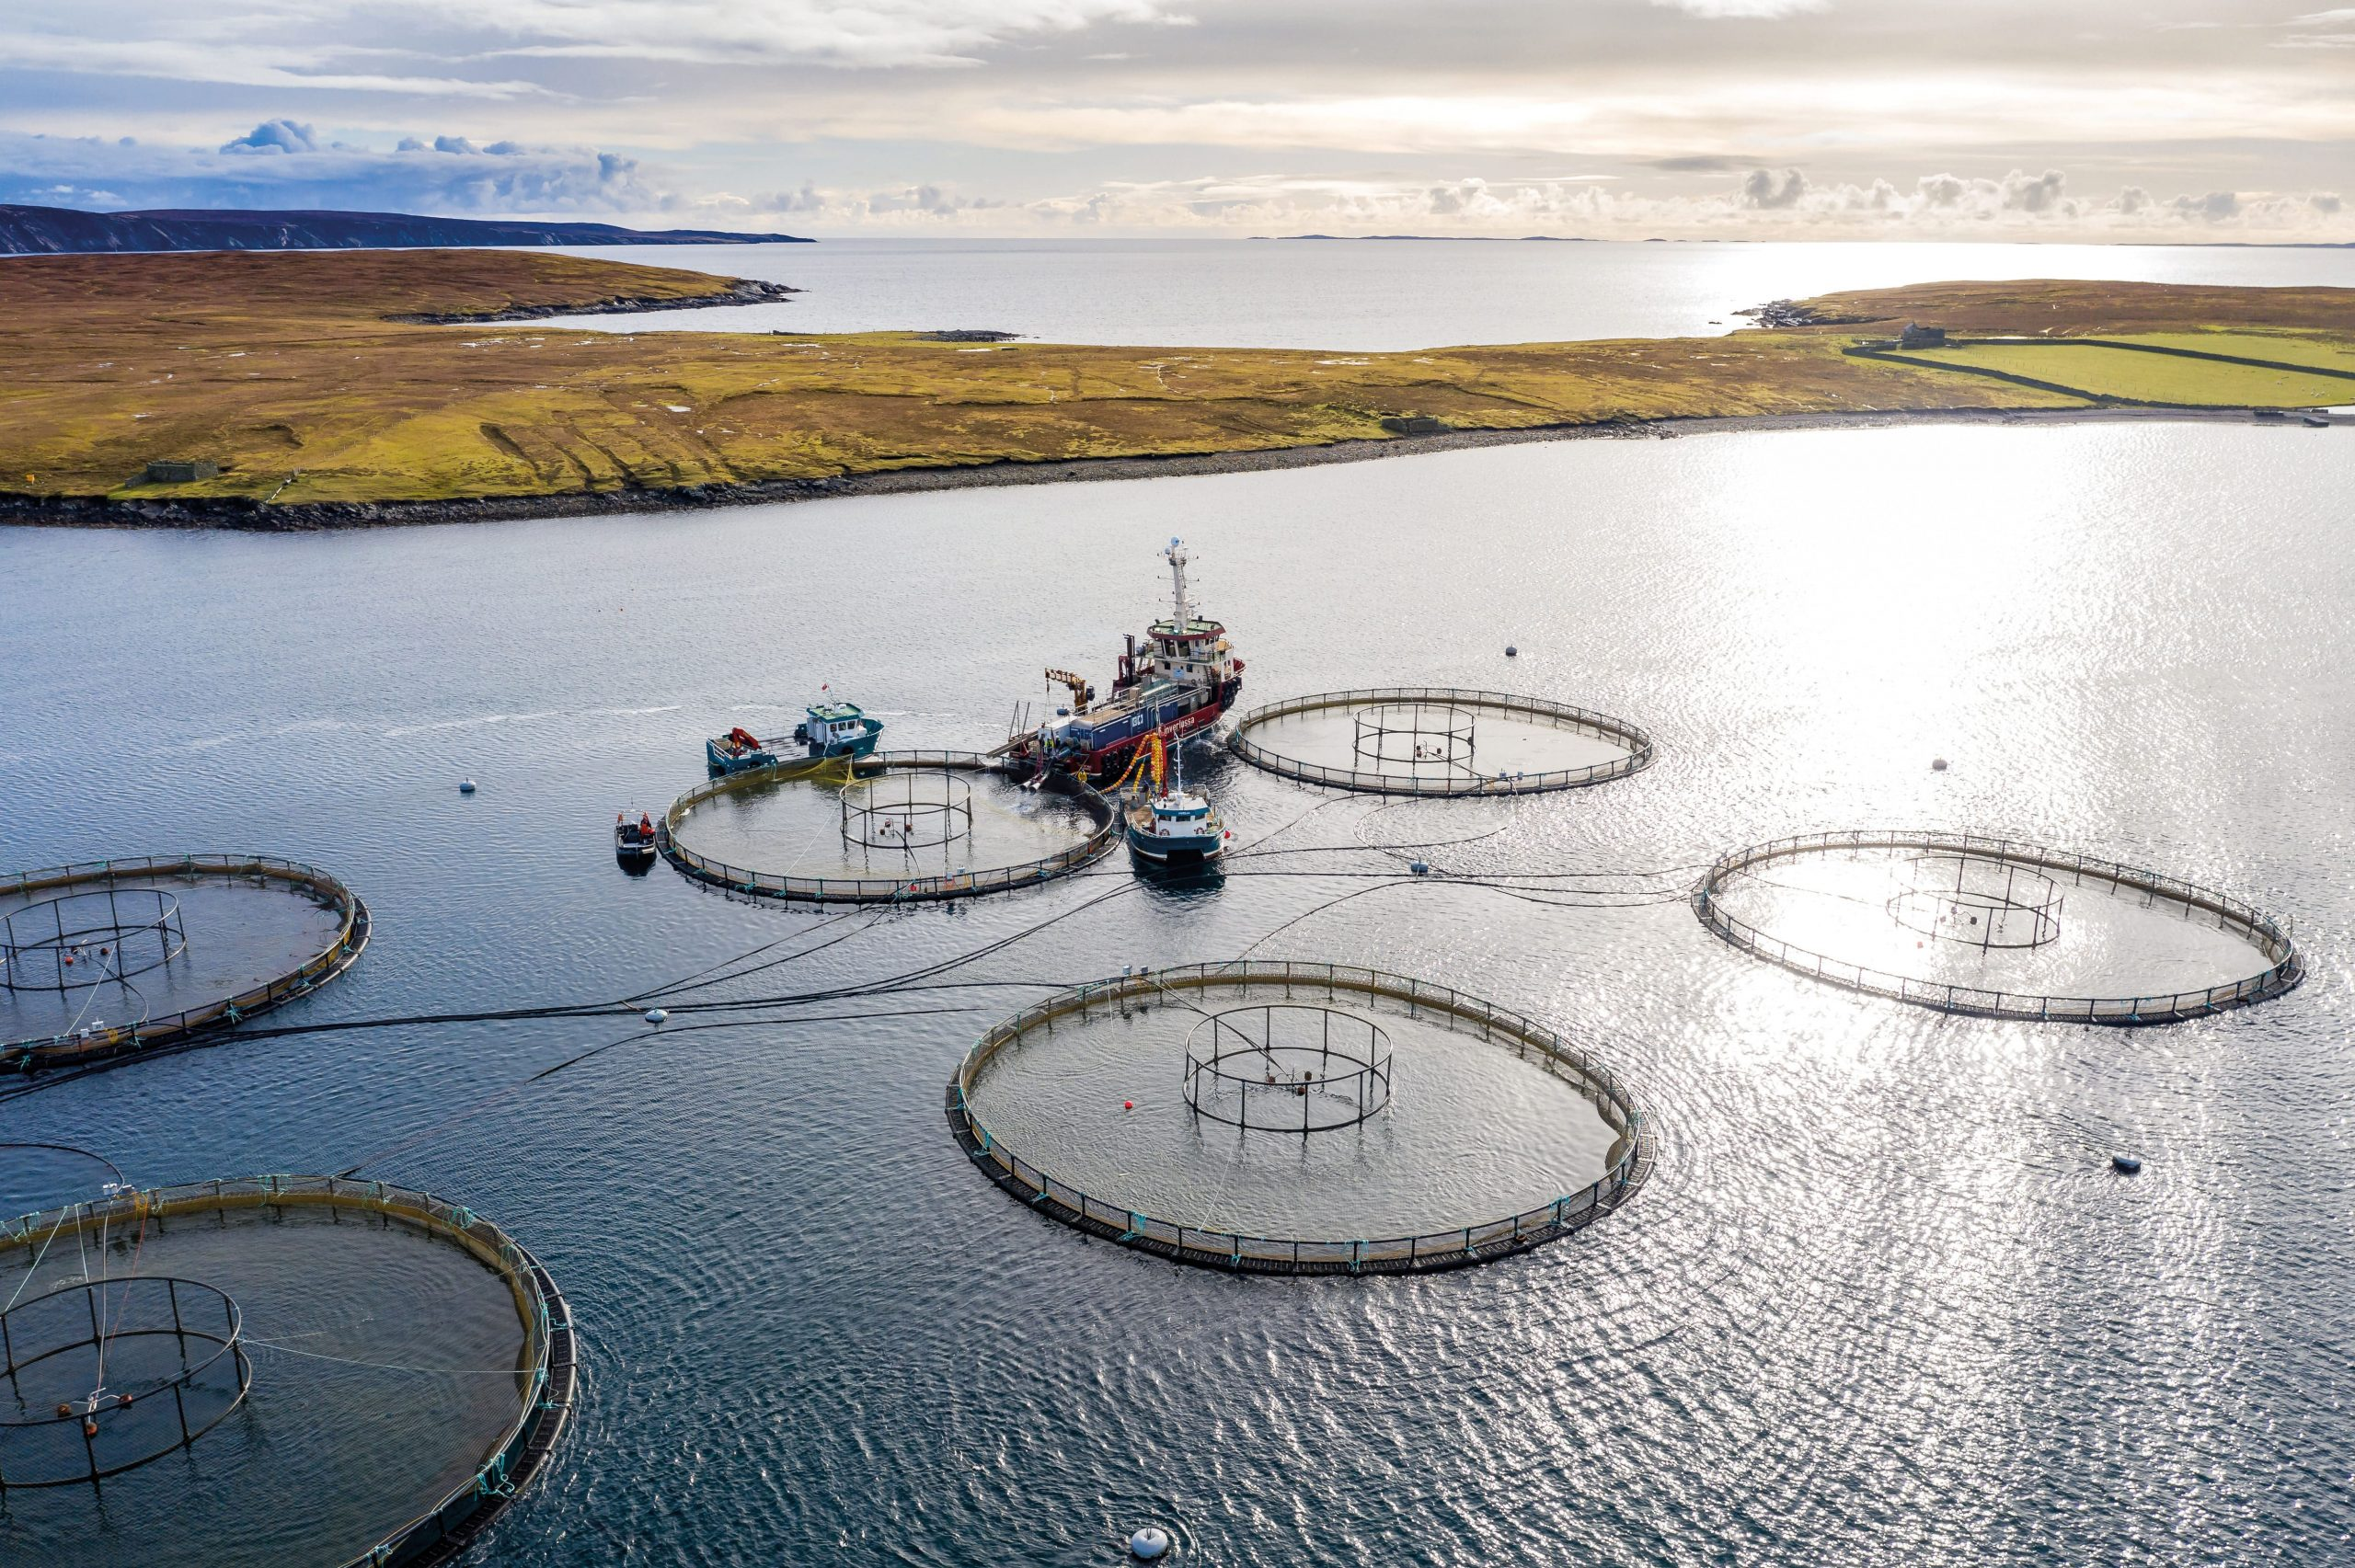 Aquaculture clean energy project